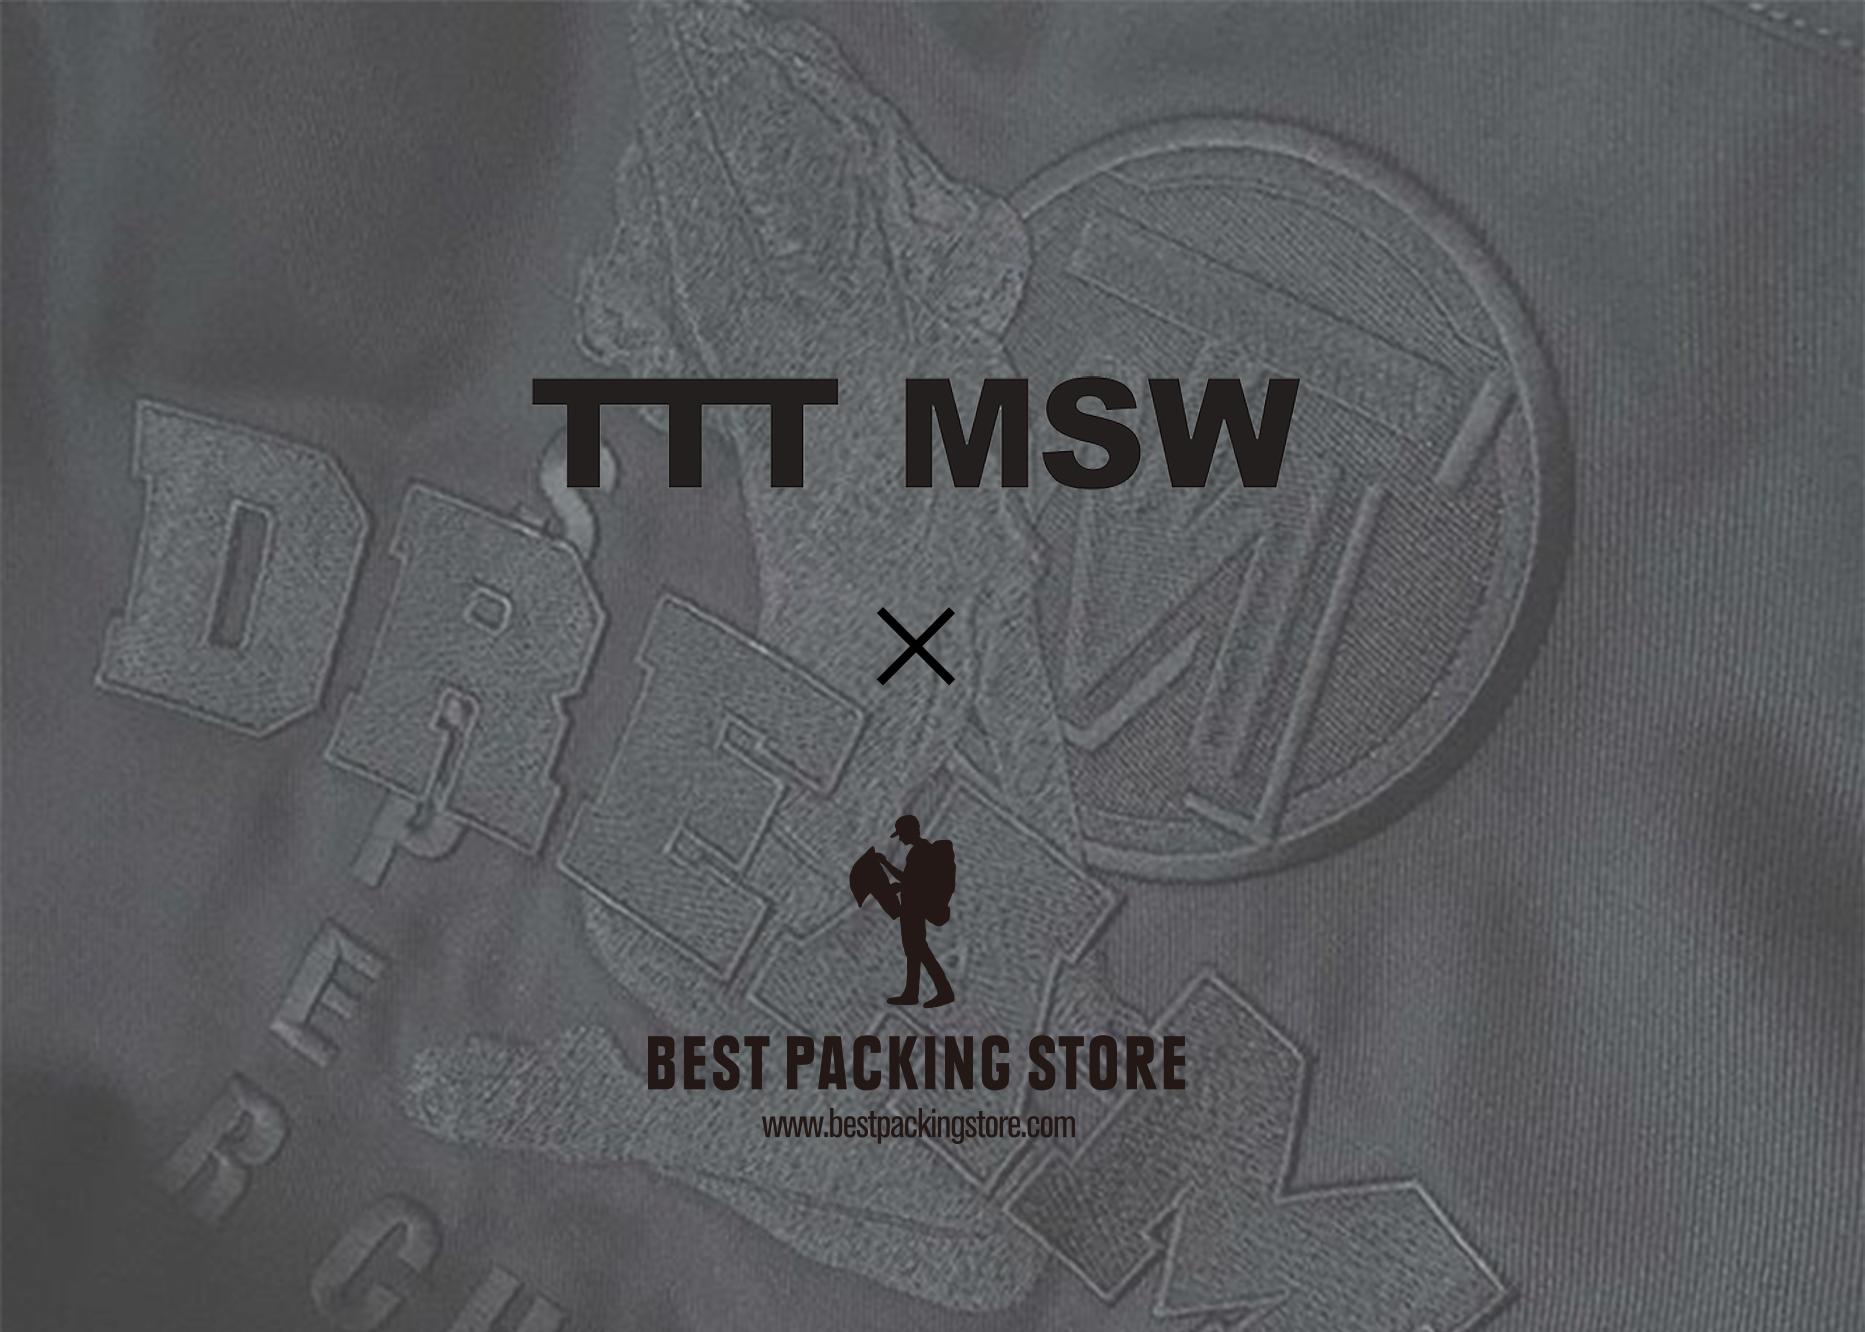 TTT_MSW × BEST PACKING STORE